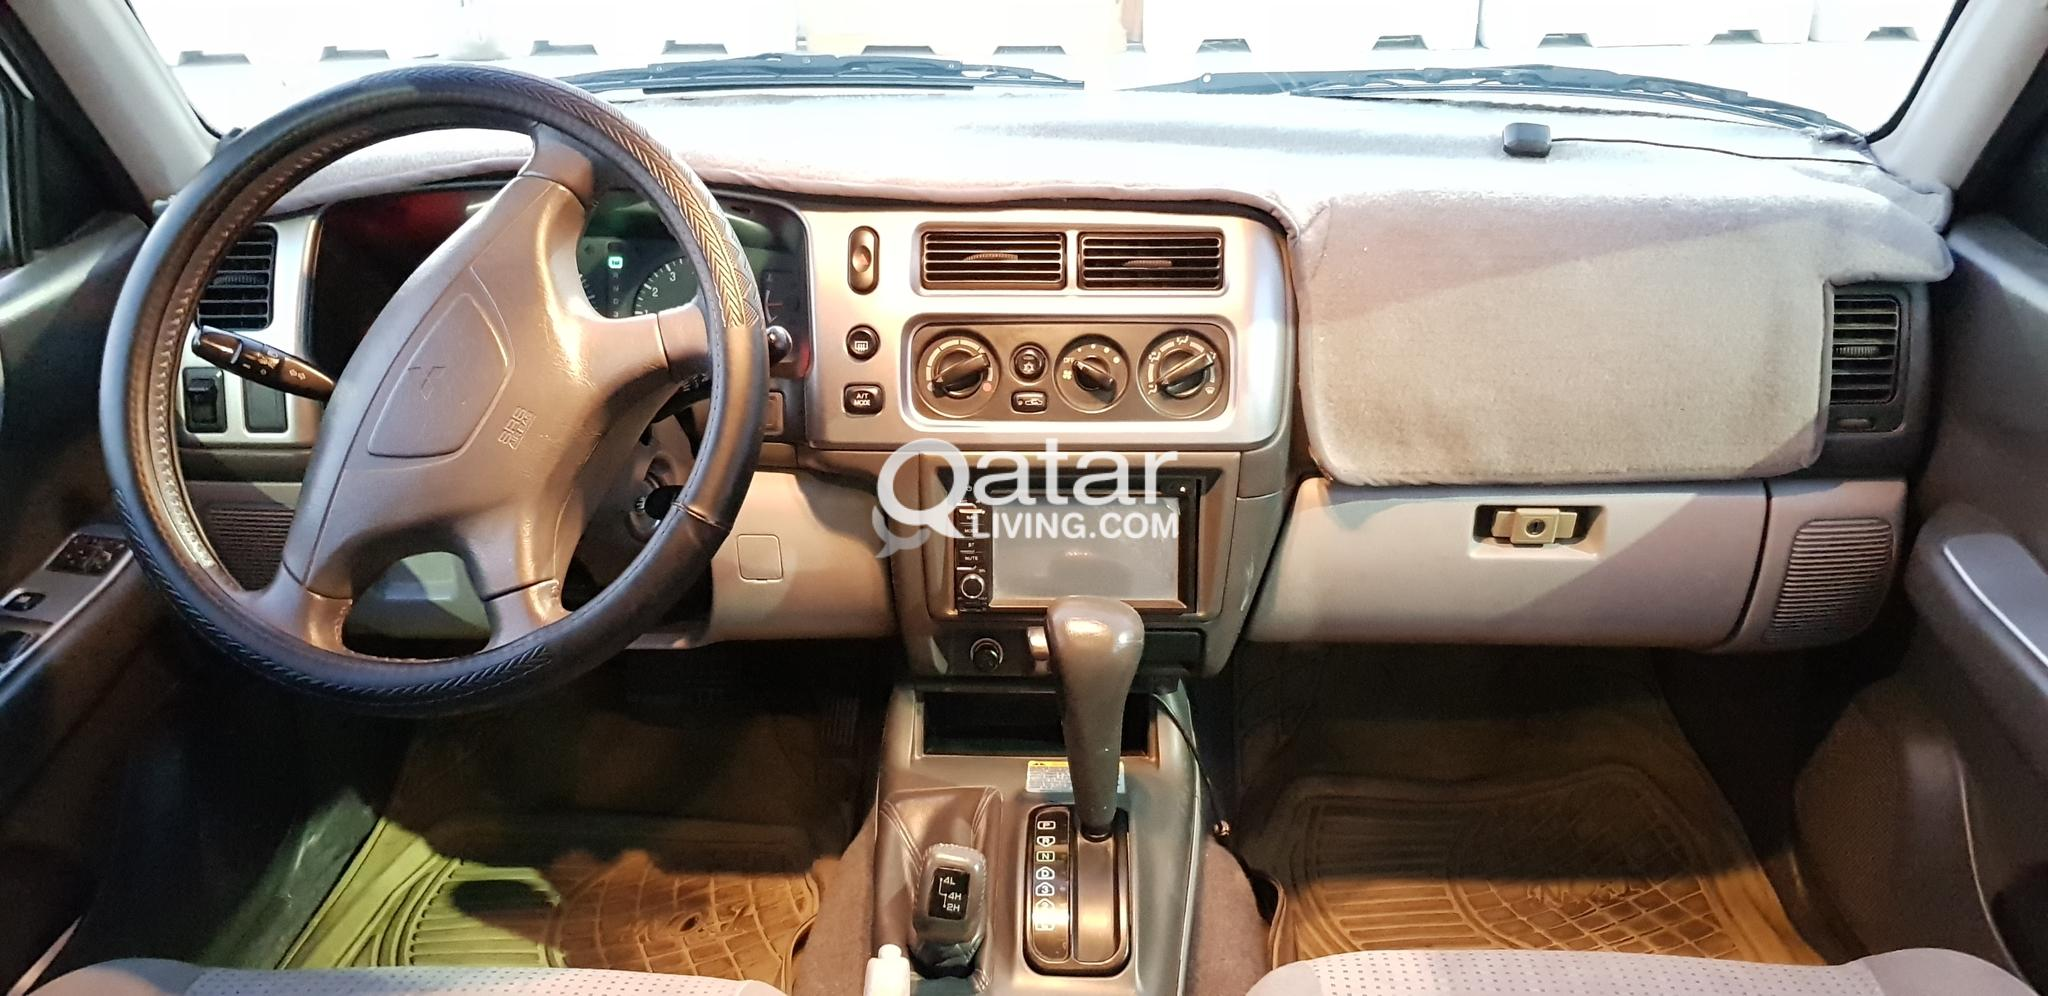 Mitsubishi Nativa 2008 SUV 4X4